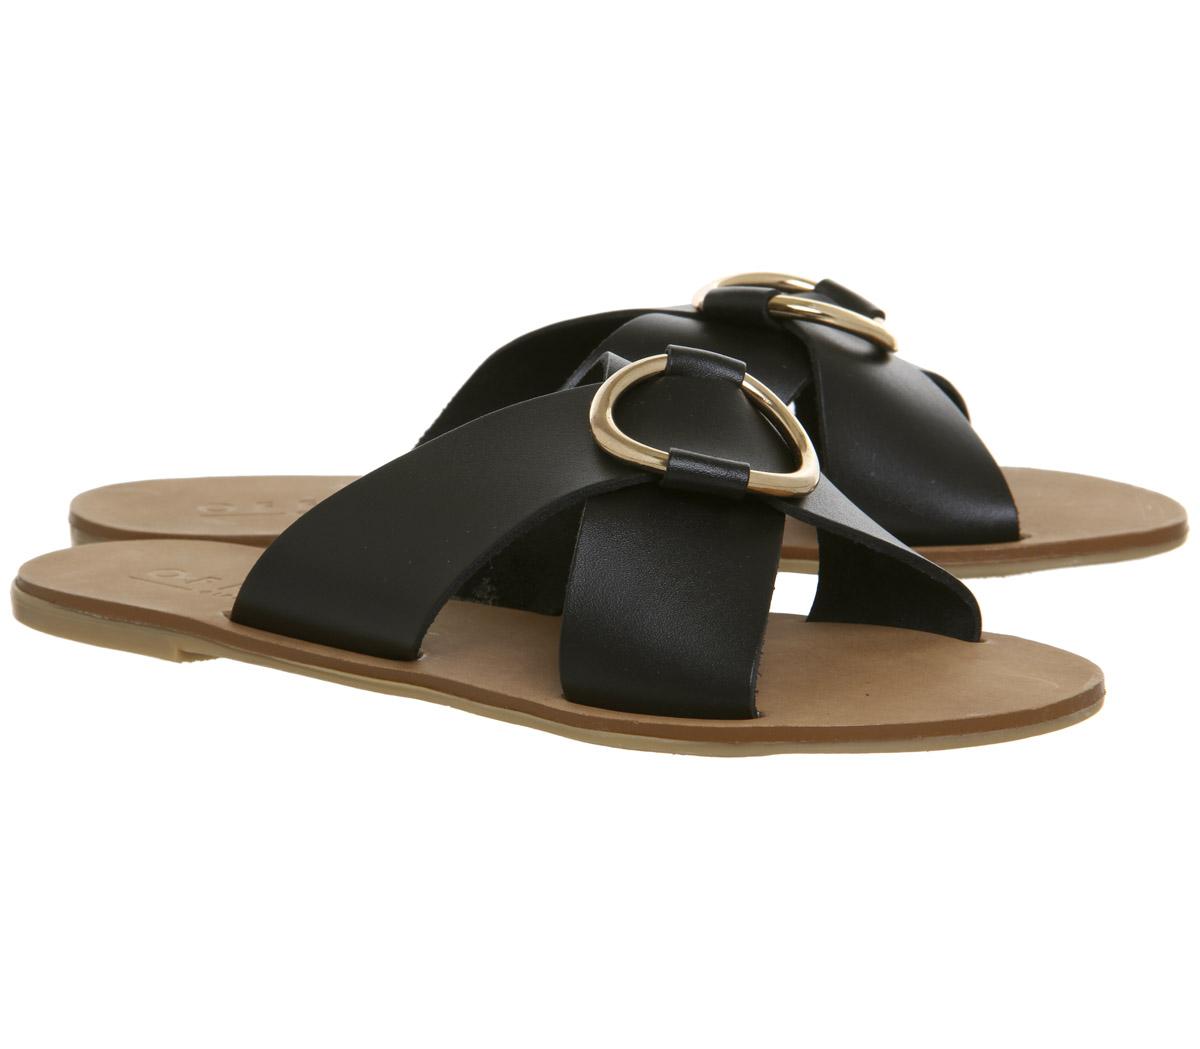 Damenschuhe Office Spirit Ring Detail Mule Sandales BLACK LEATHER GOLD RING Sandales